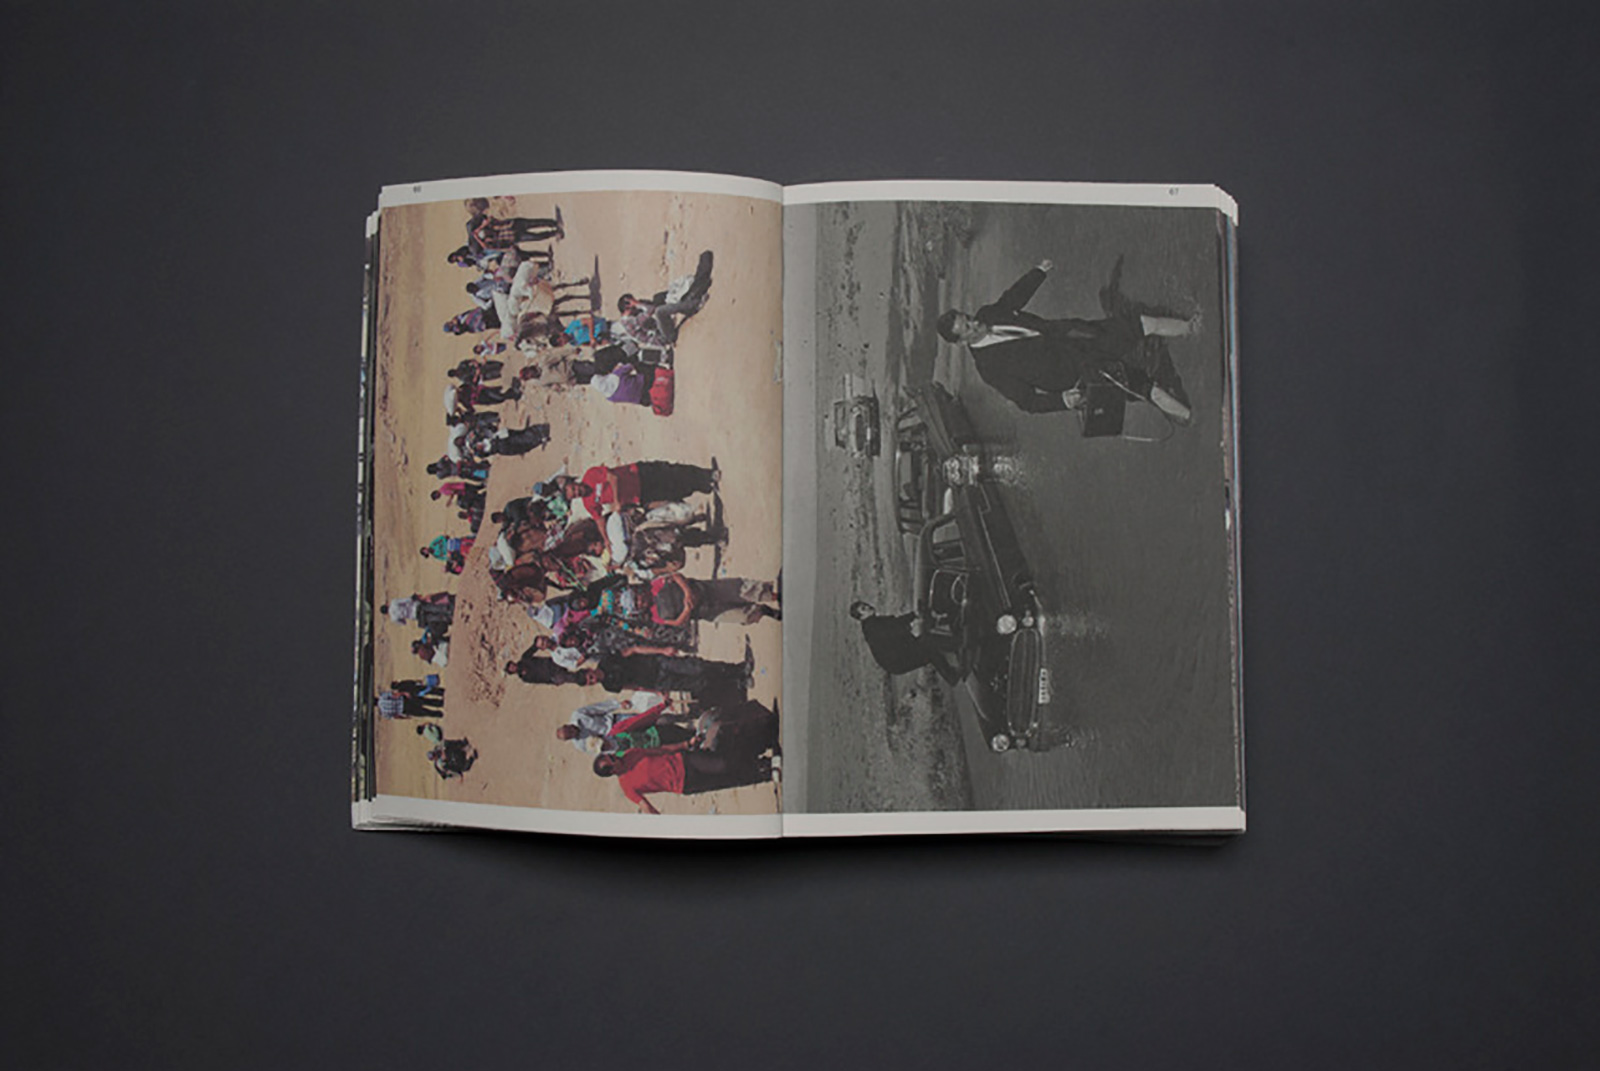 whats-inside-the-koffer-book-wilco-monen-05.jpg